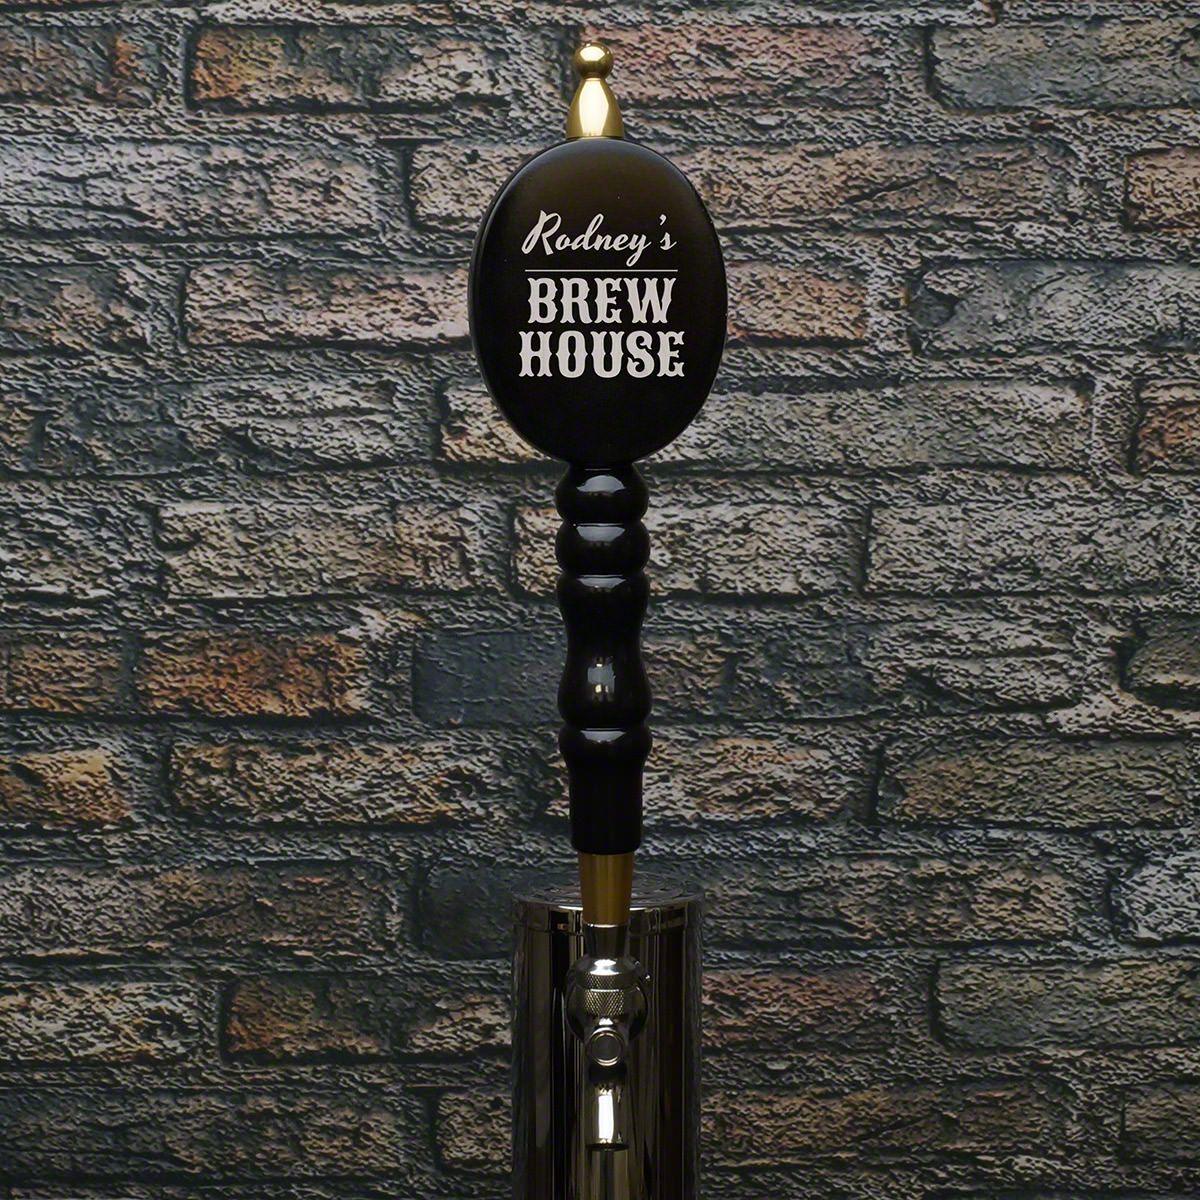 Personal Brew House Black Beer Tap Handle